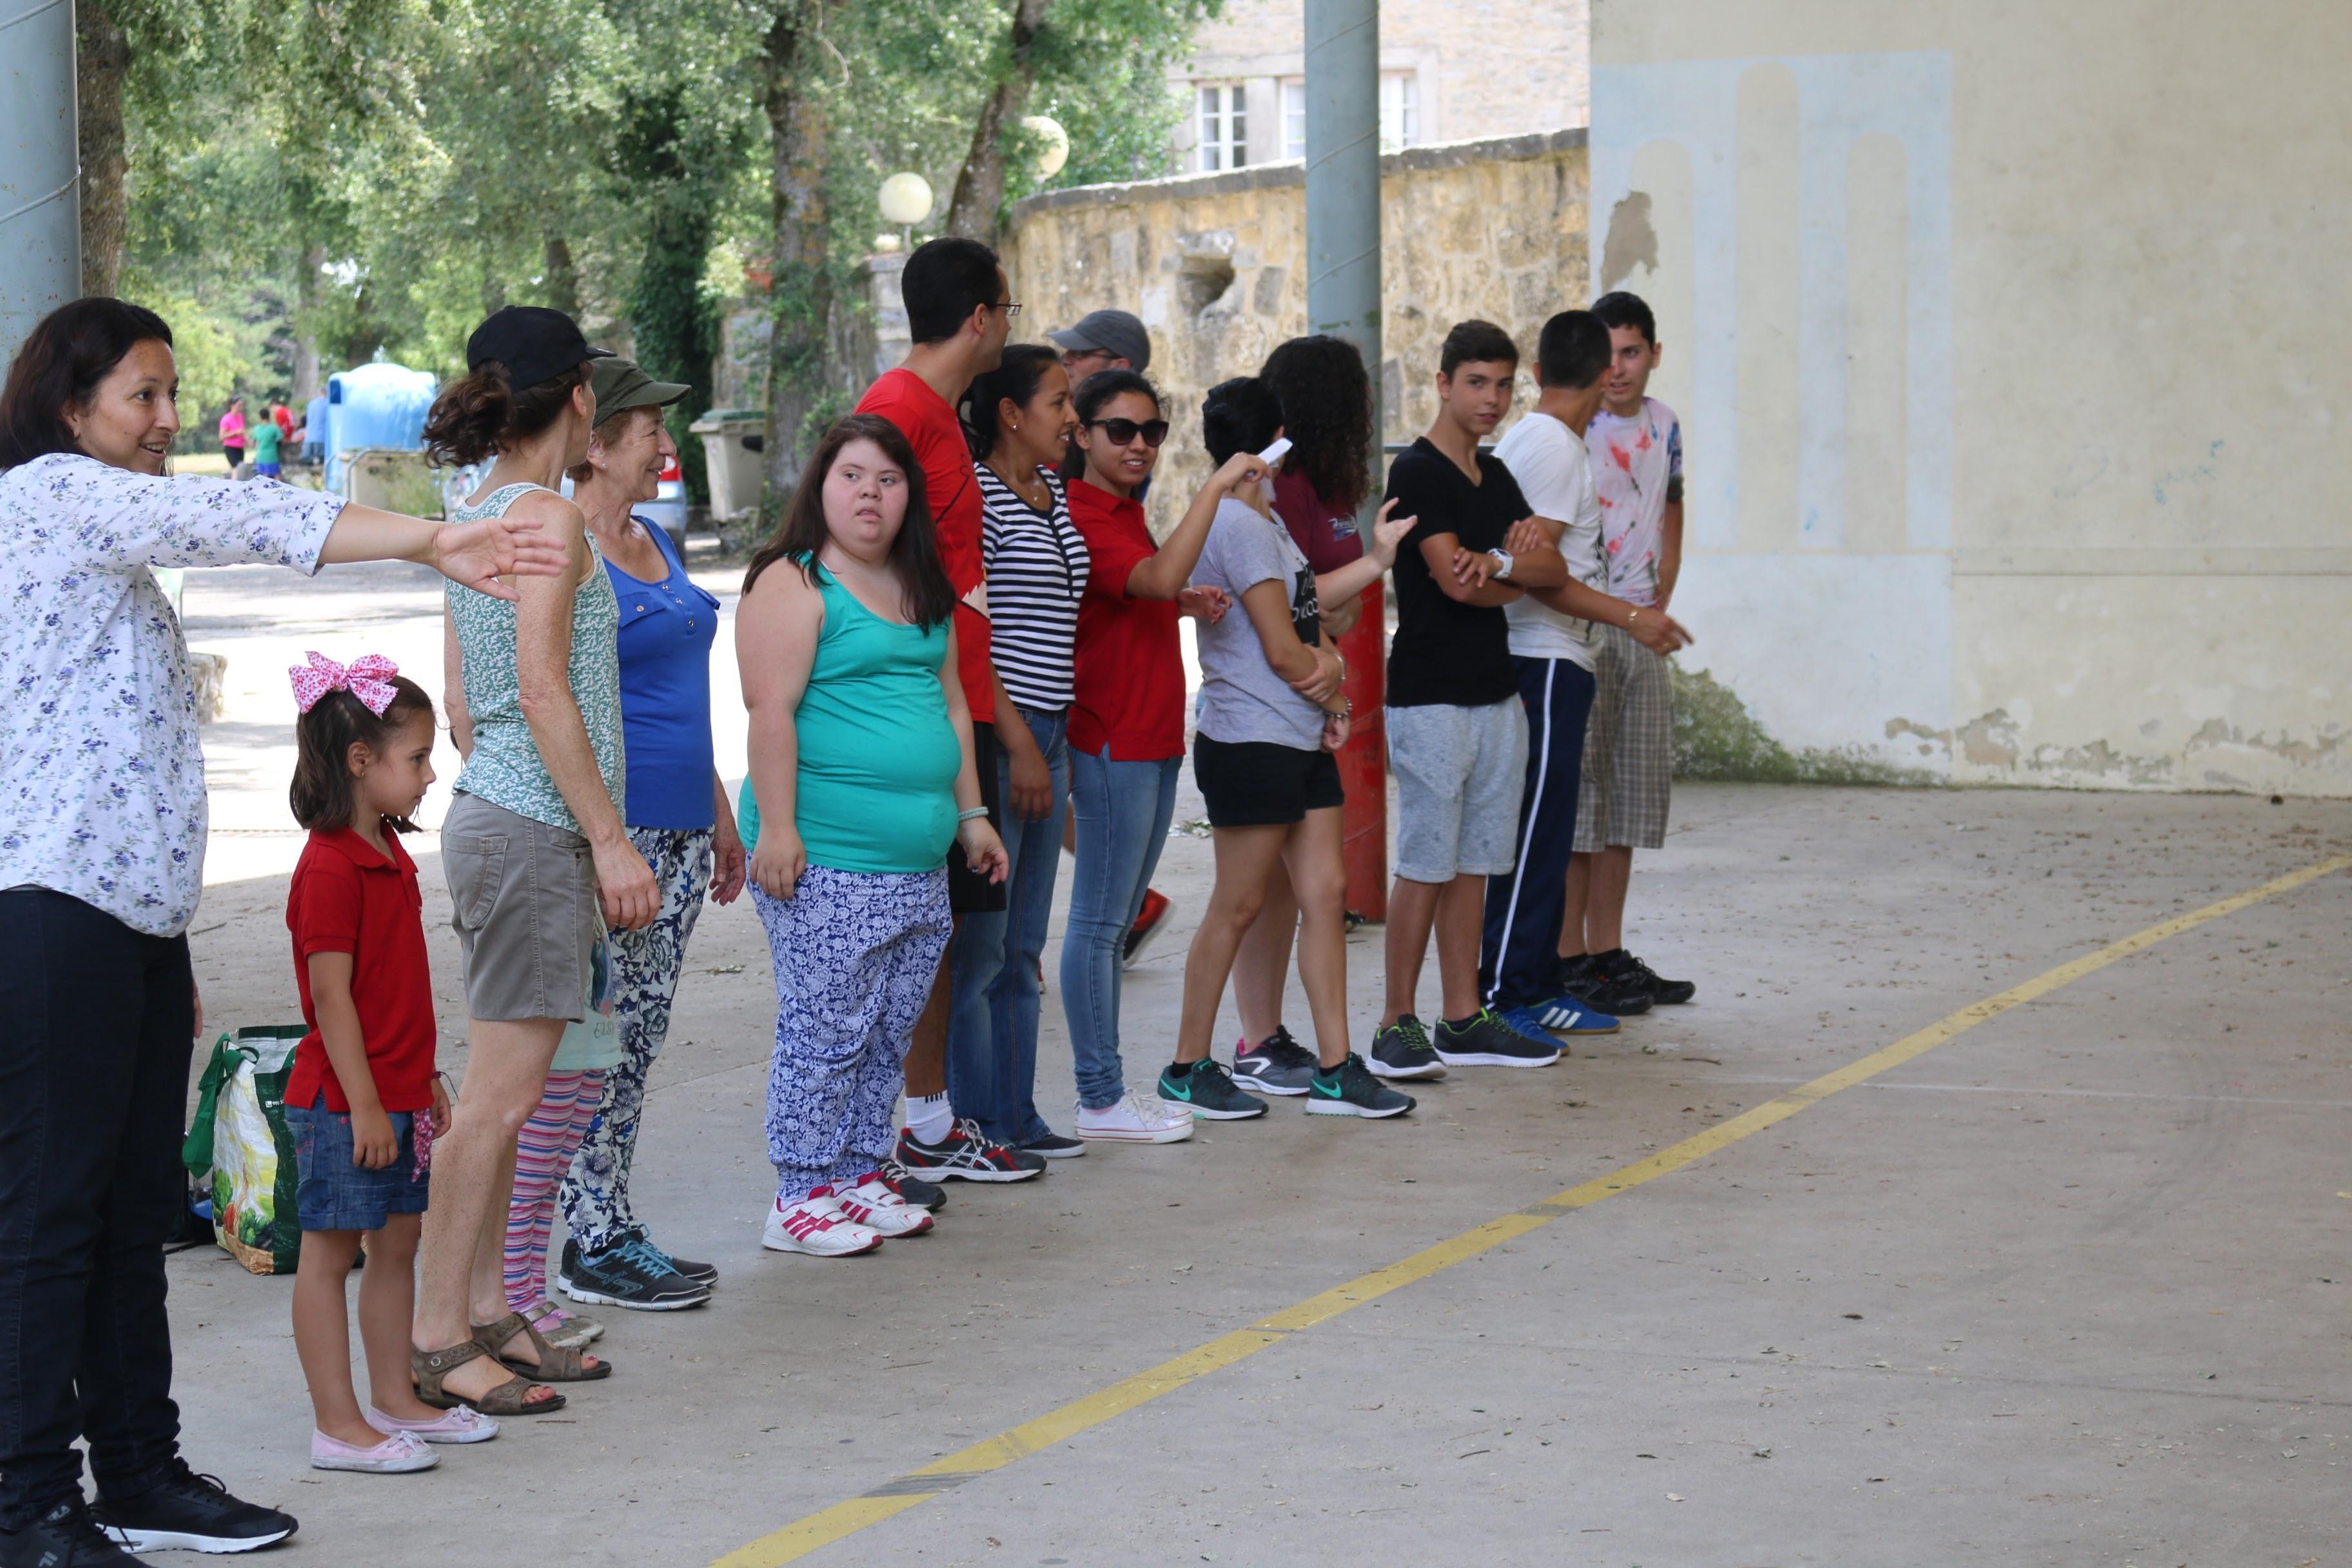 Picasa - Día de Campo SdJ 05.07.2015 (32).jpg